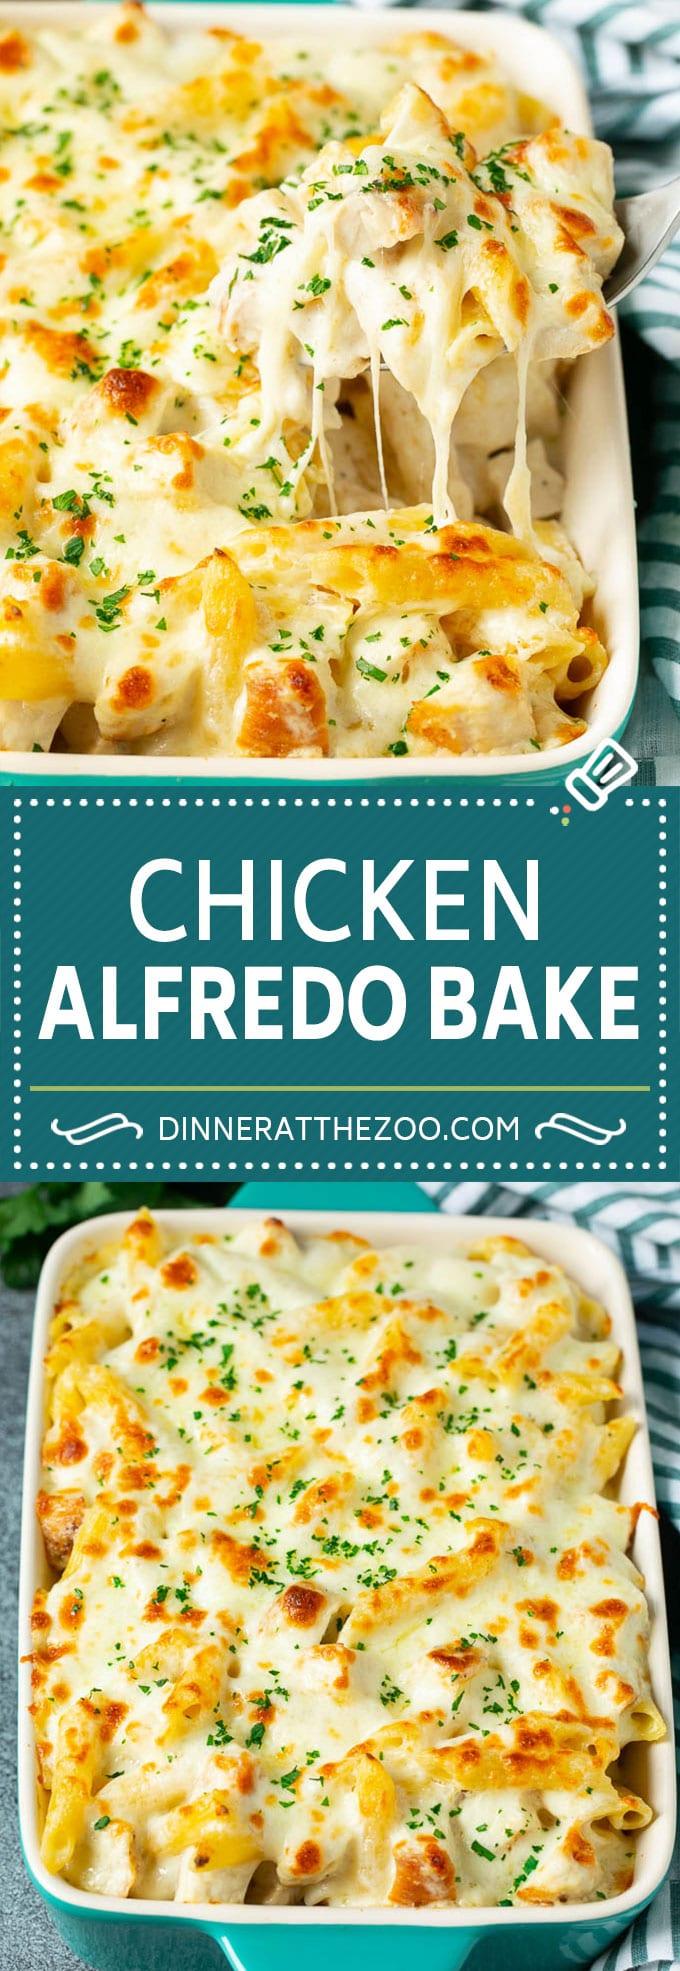 Chicken Alfredo Bake - Dinner at the Zoo